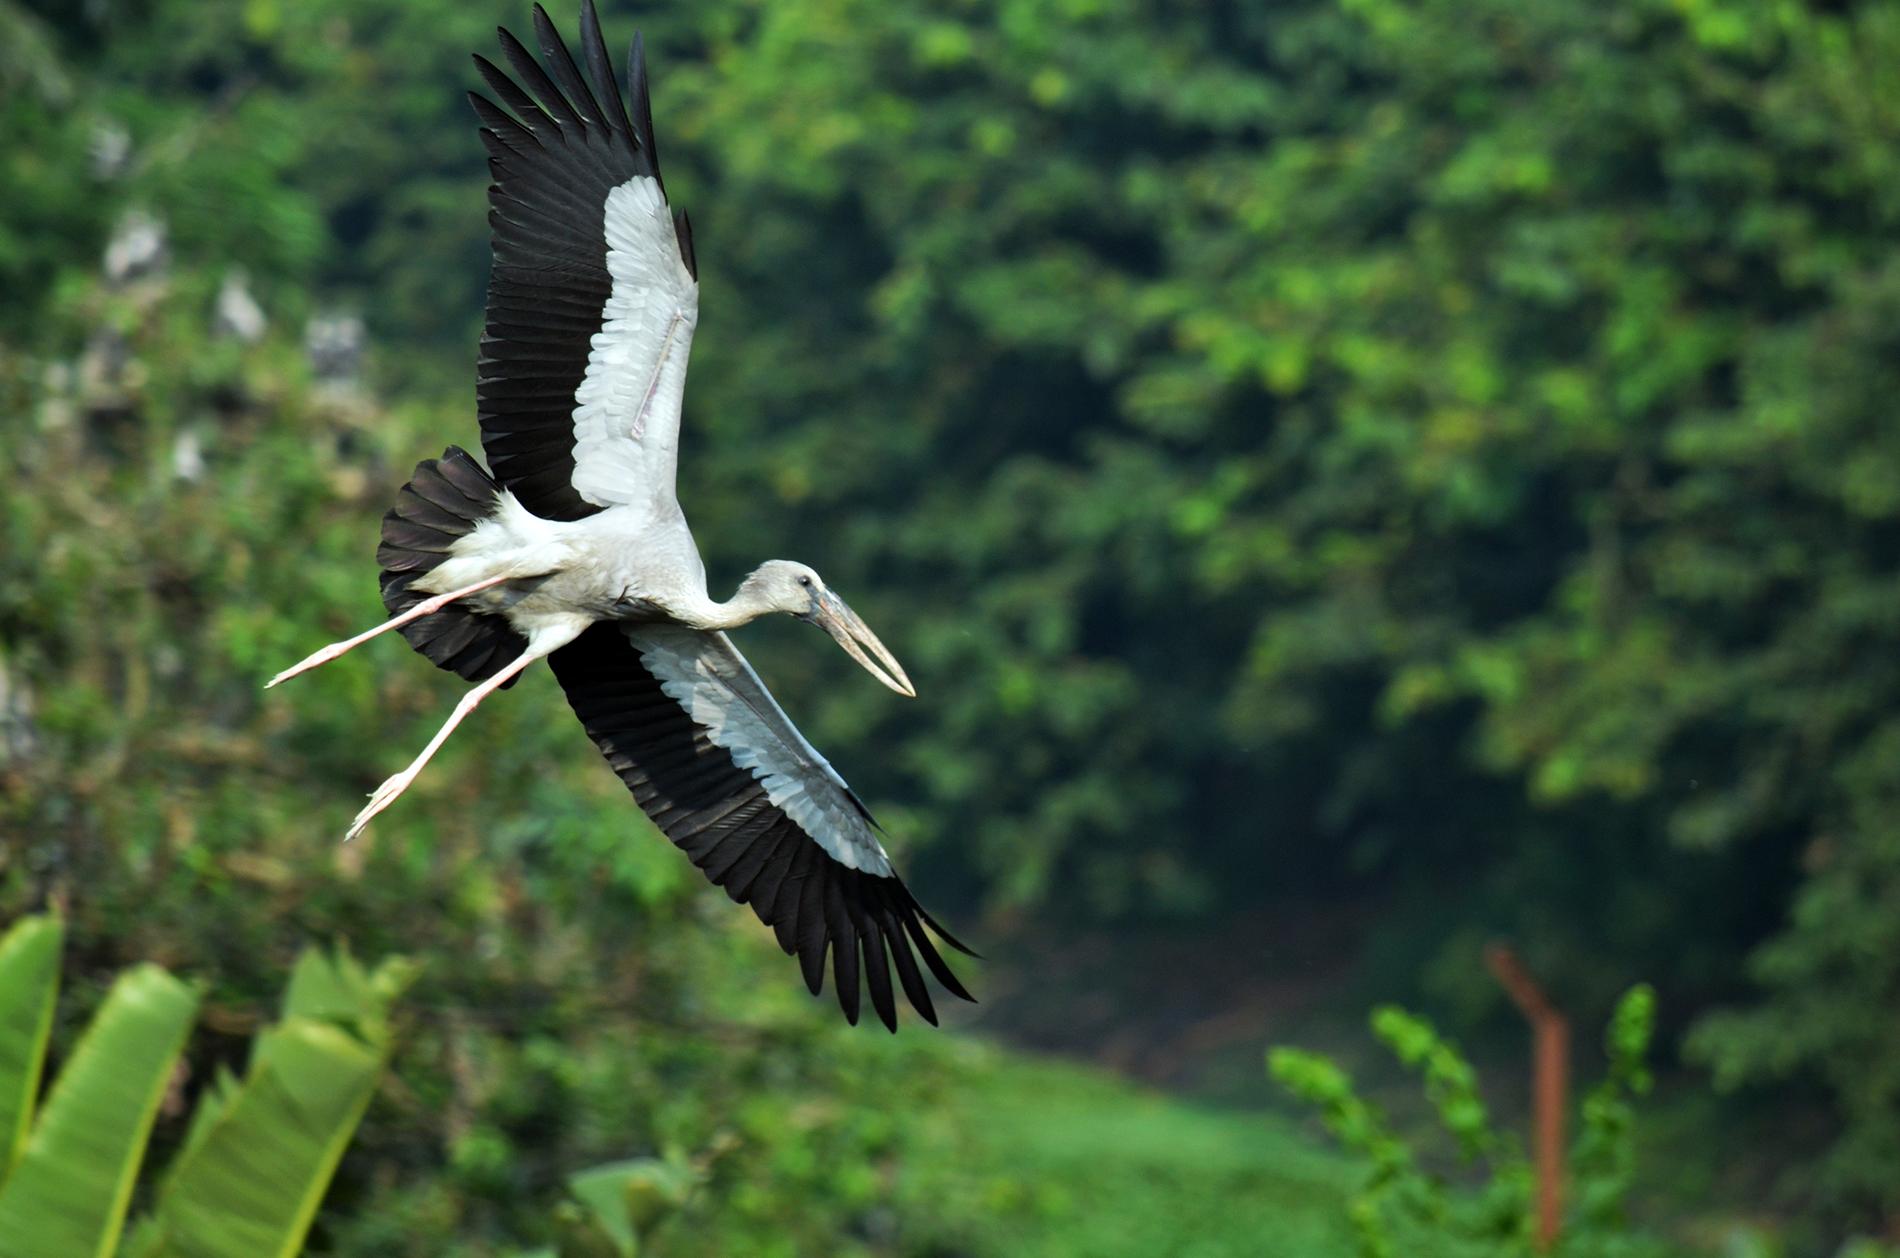 Asian openbill stork in flight at Kulik Bird Sanctuary, West Bengal